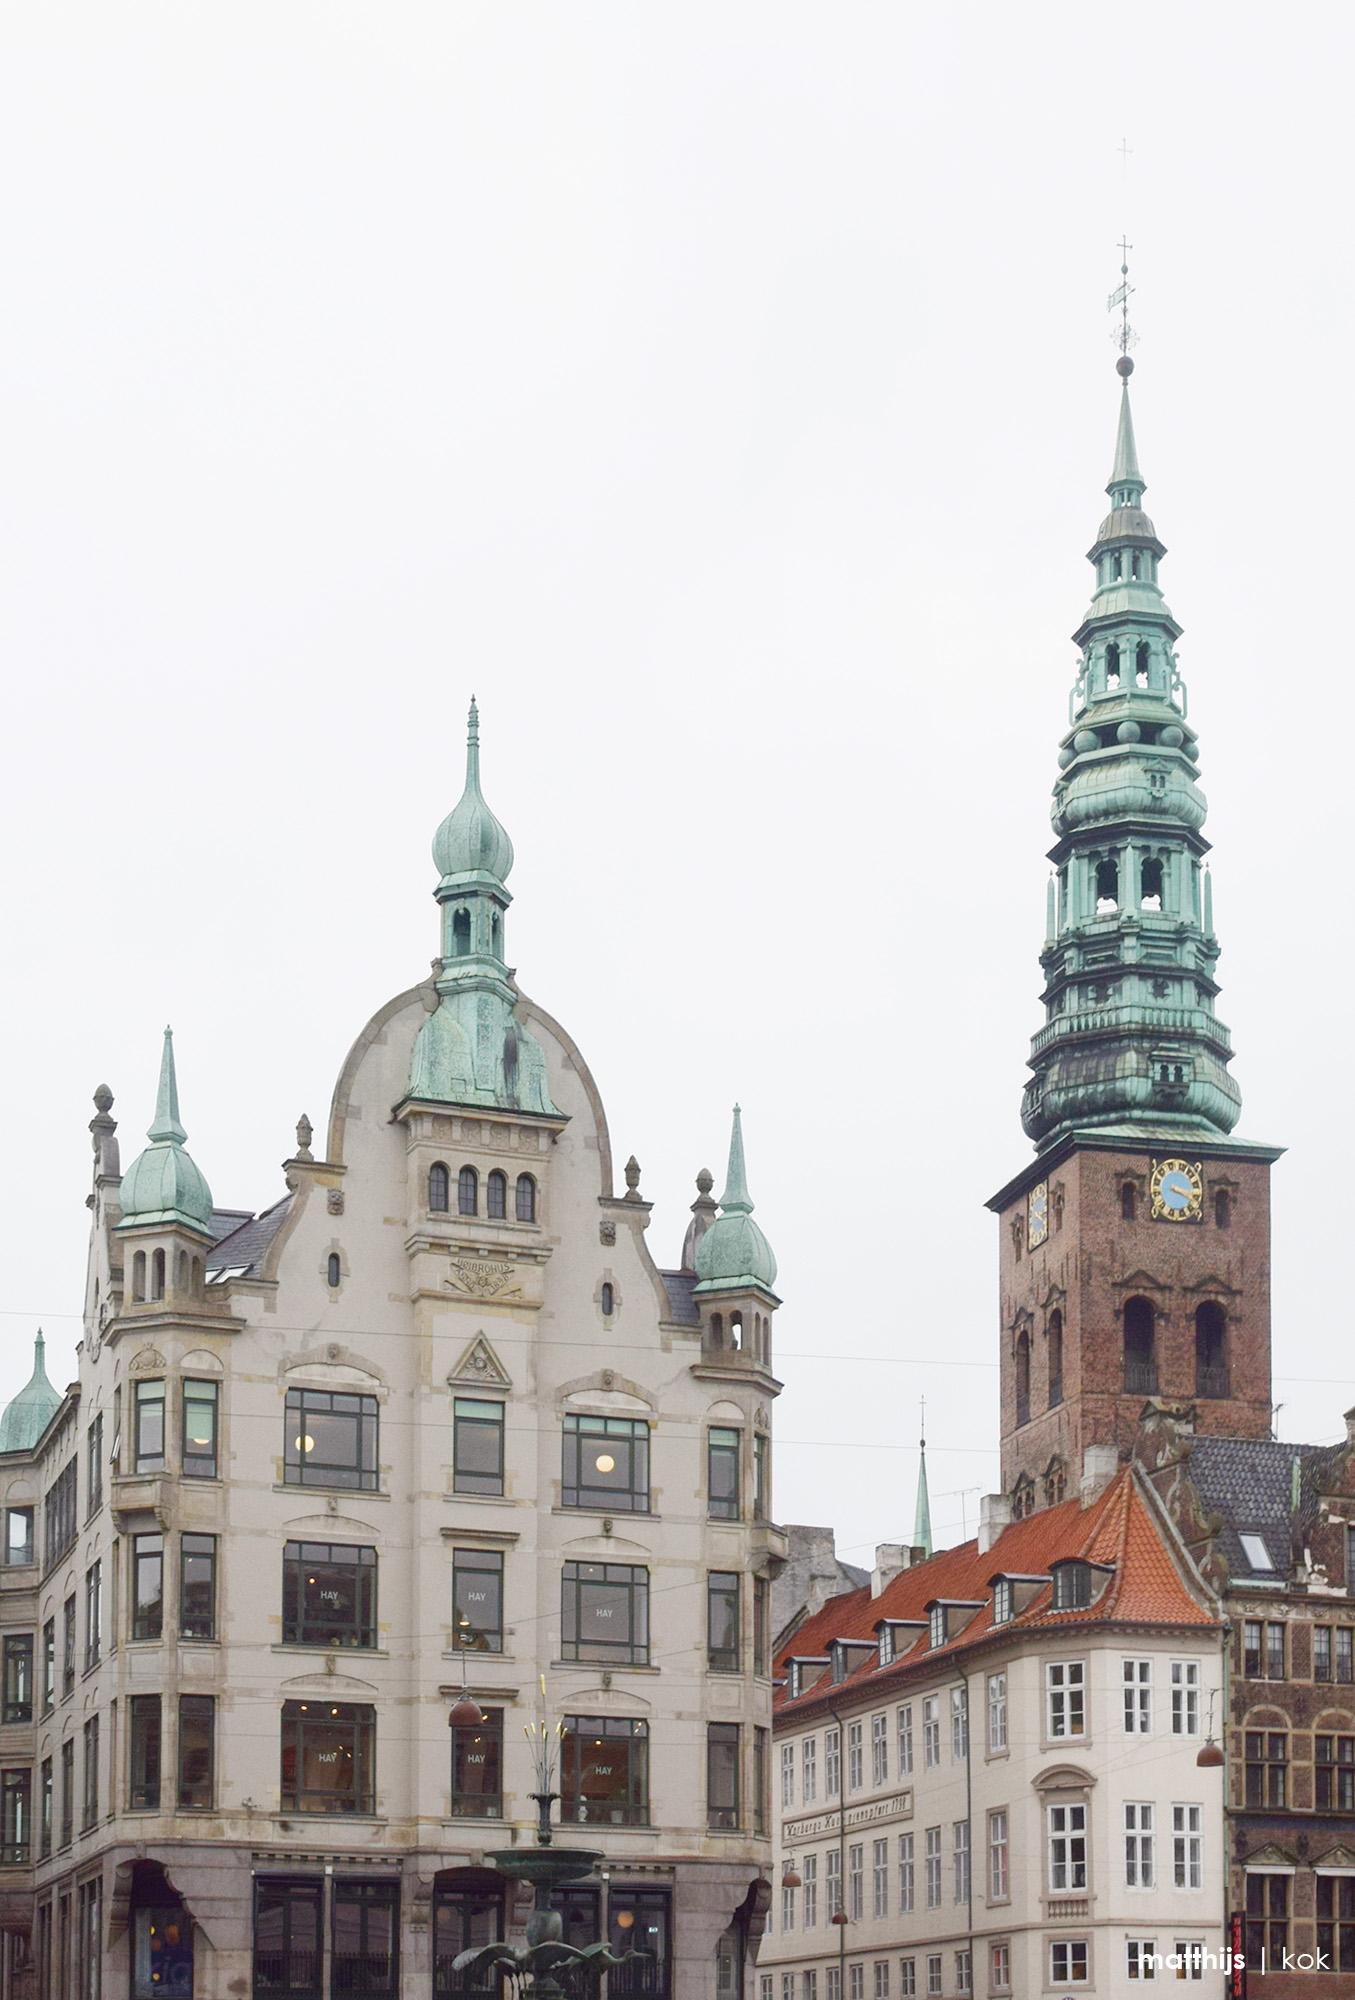 Strøget, Copenhagen, Denmark | Photo by Matthijs Kok